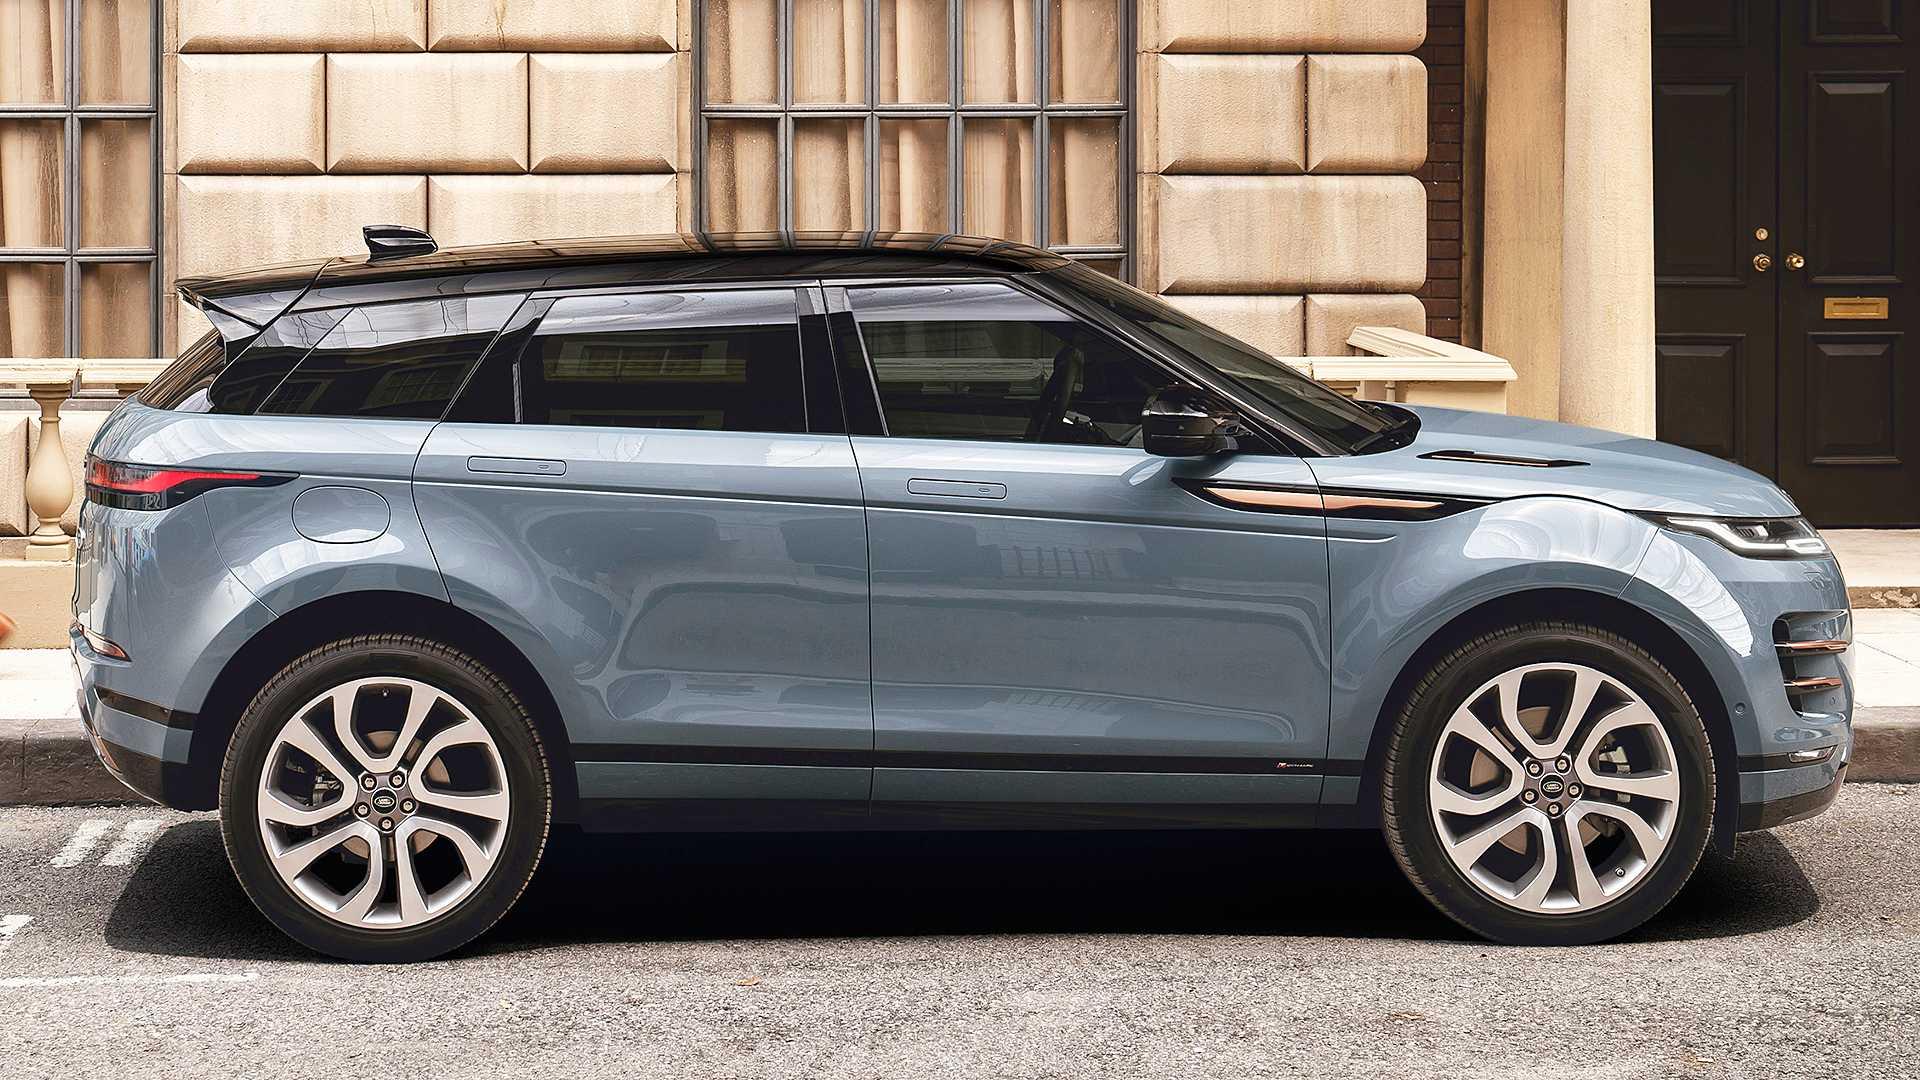 2020-range-rover-evoque (59)